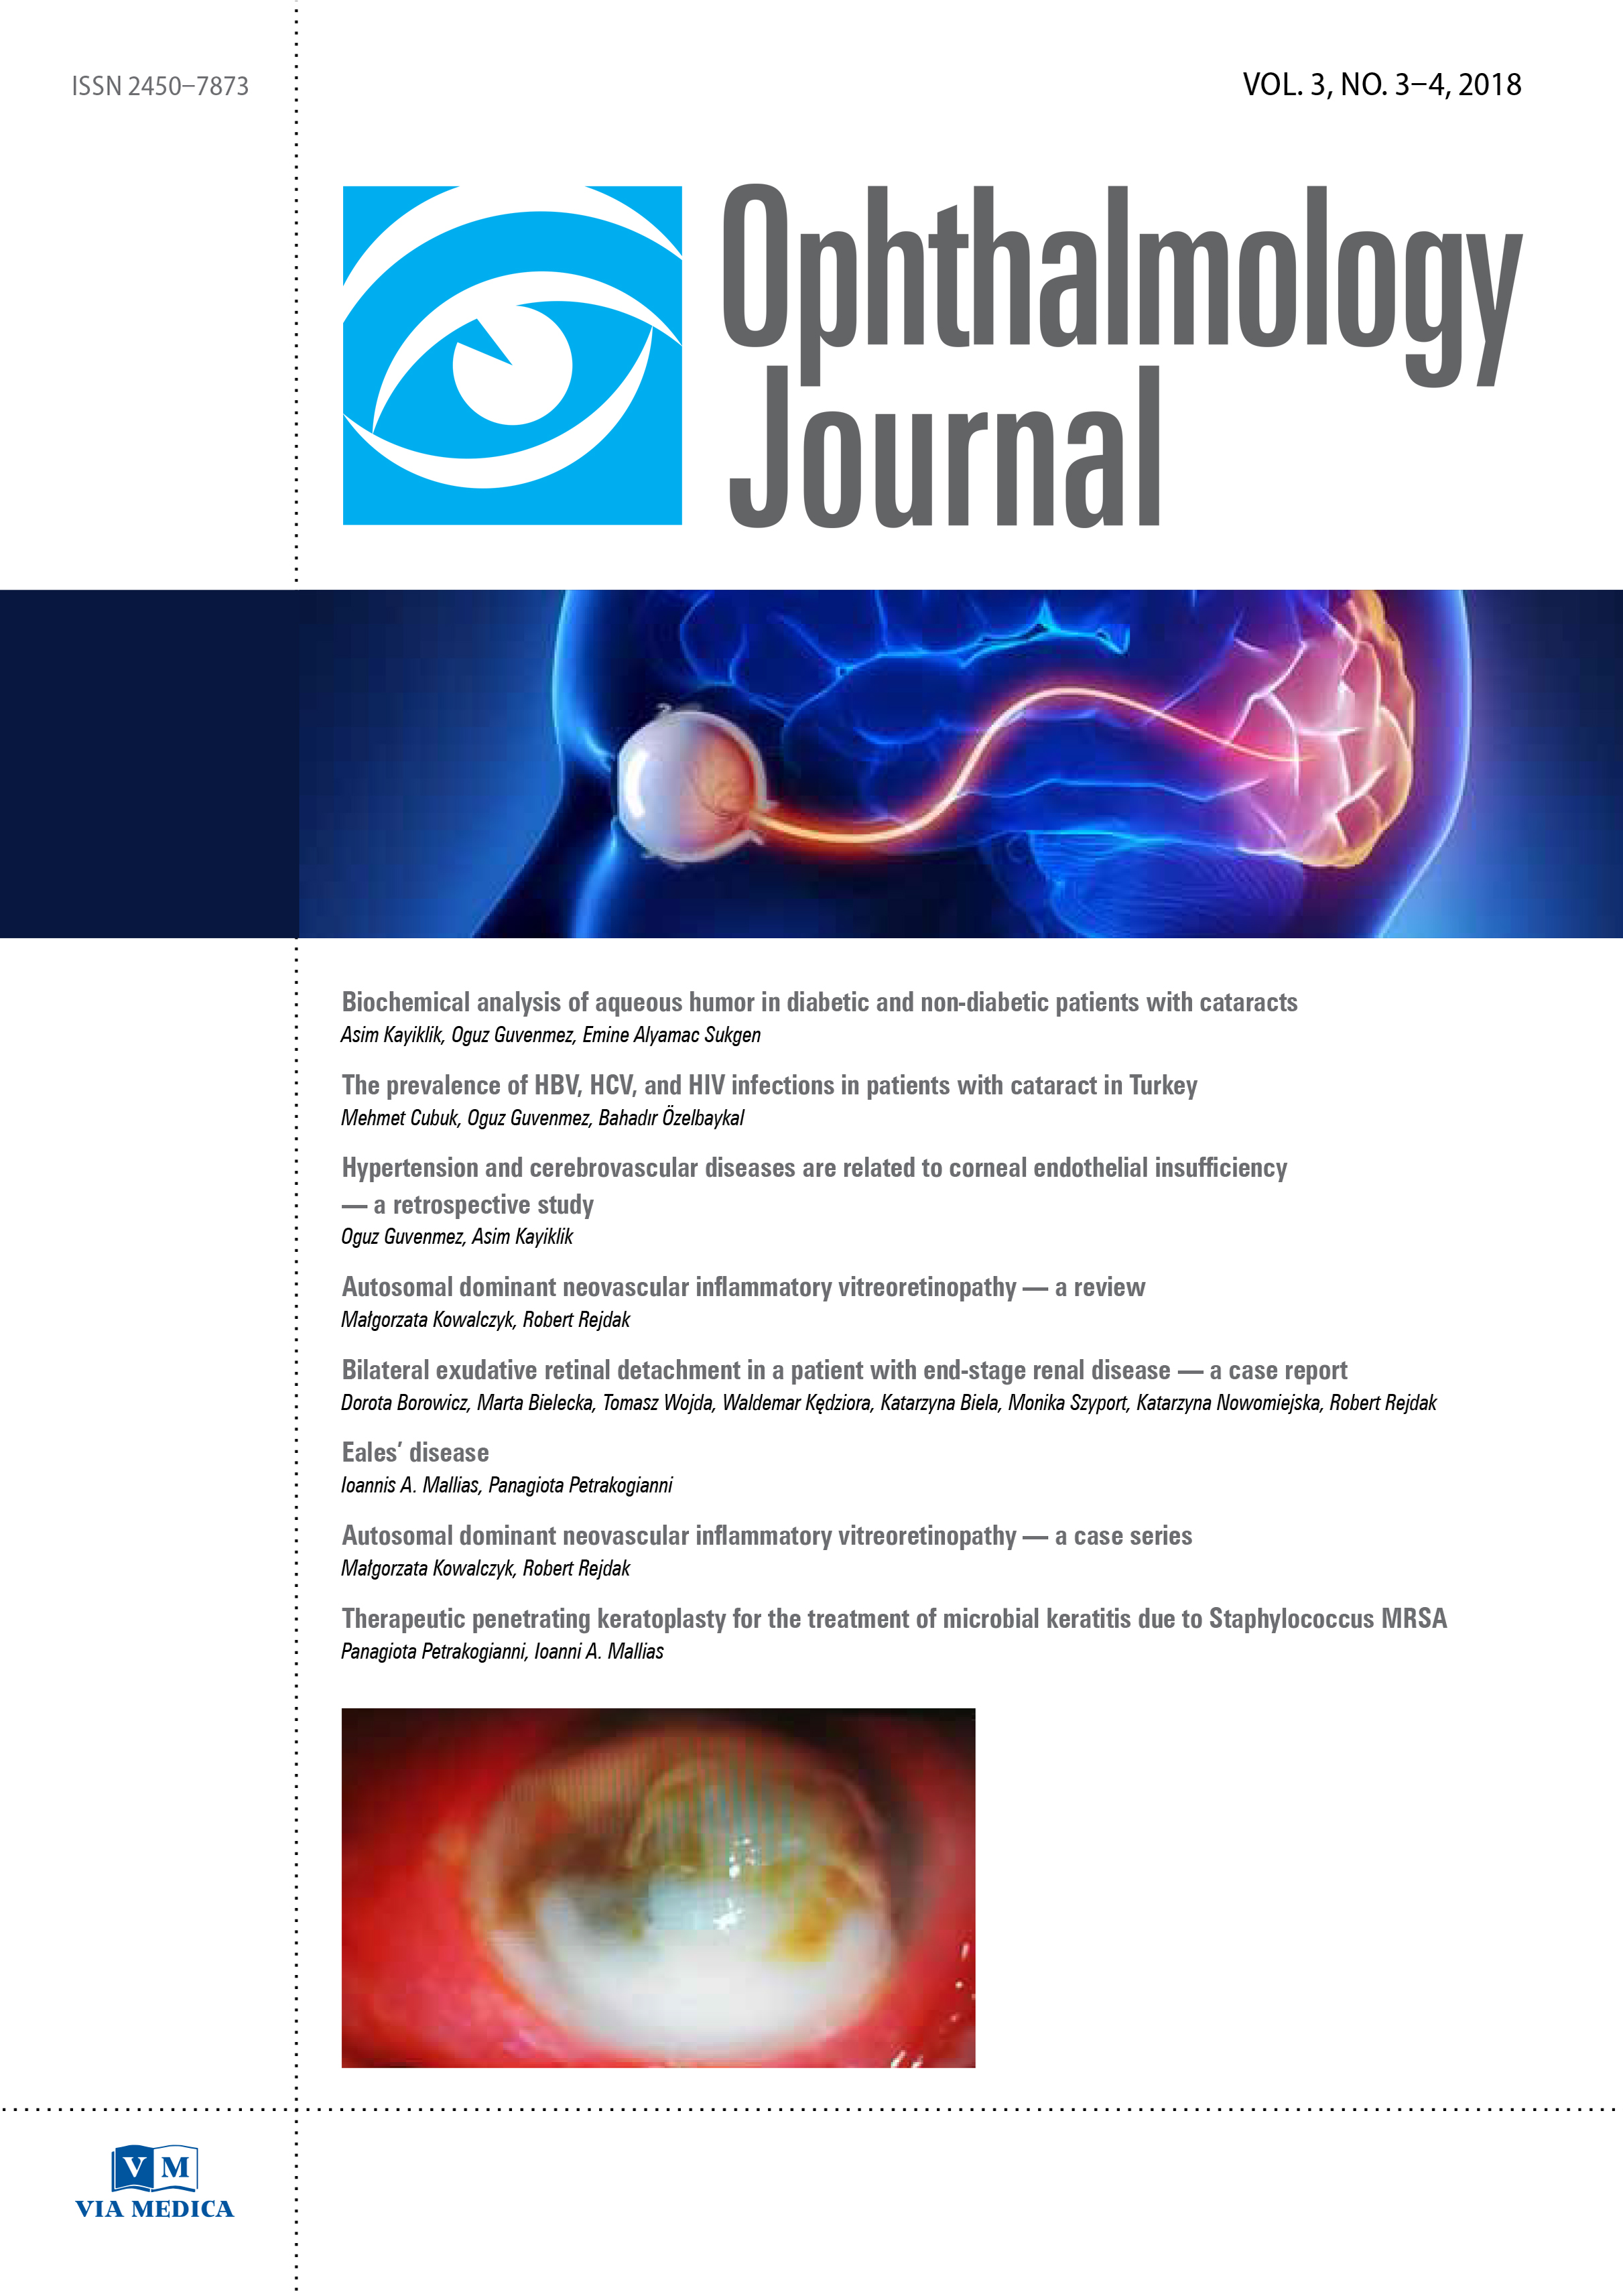 Ophthalmology Journal